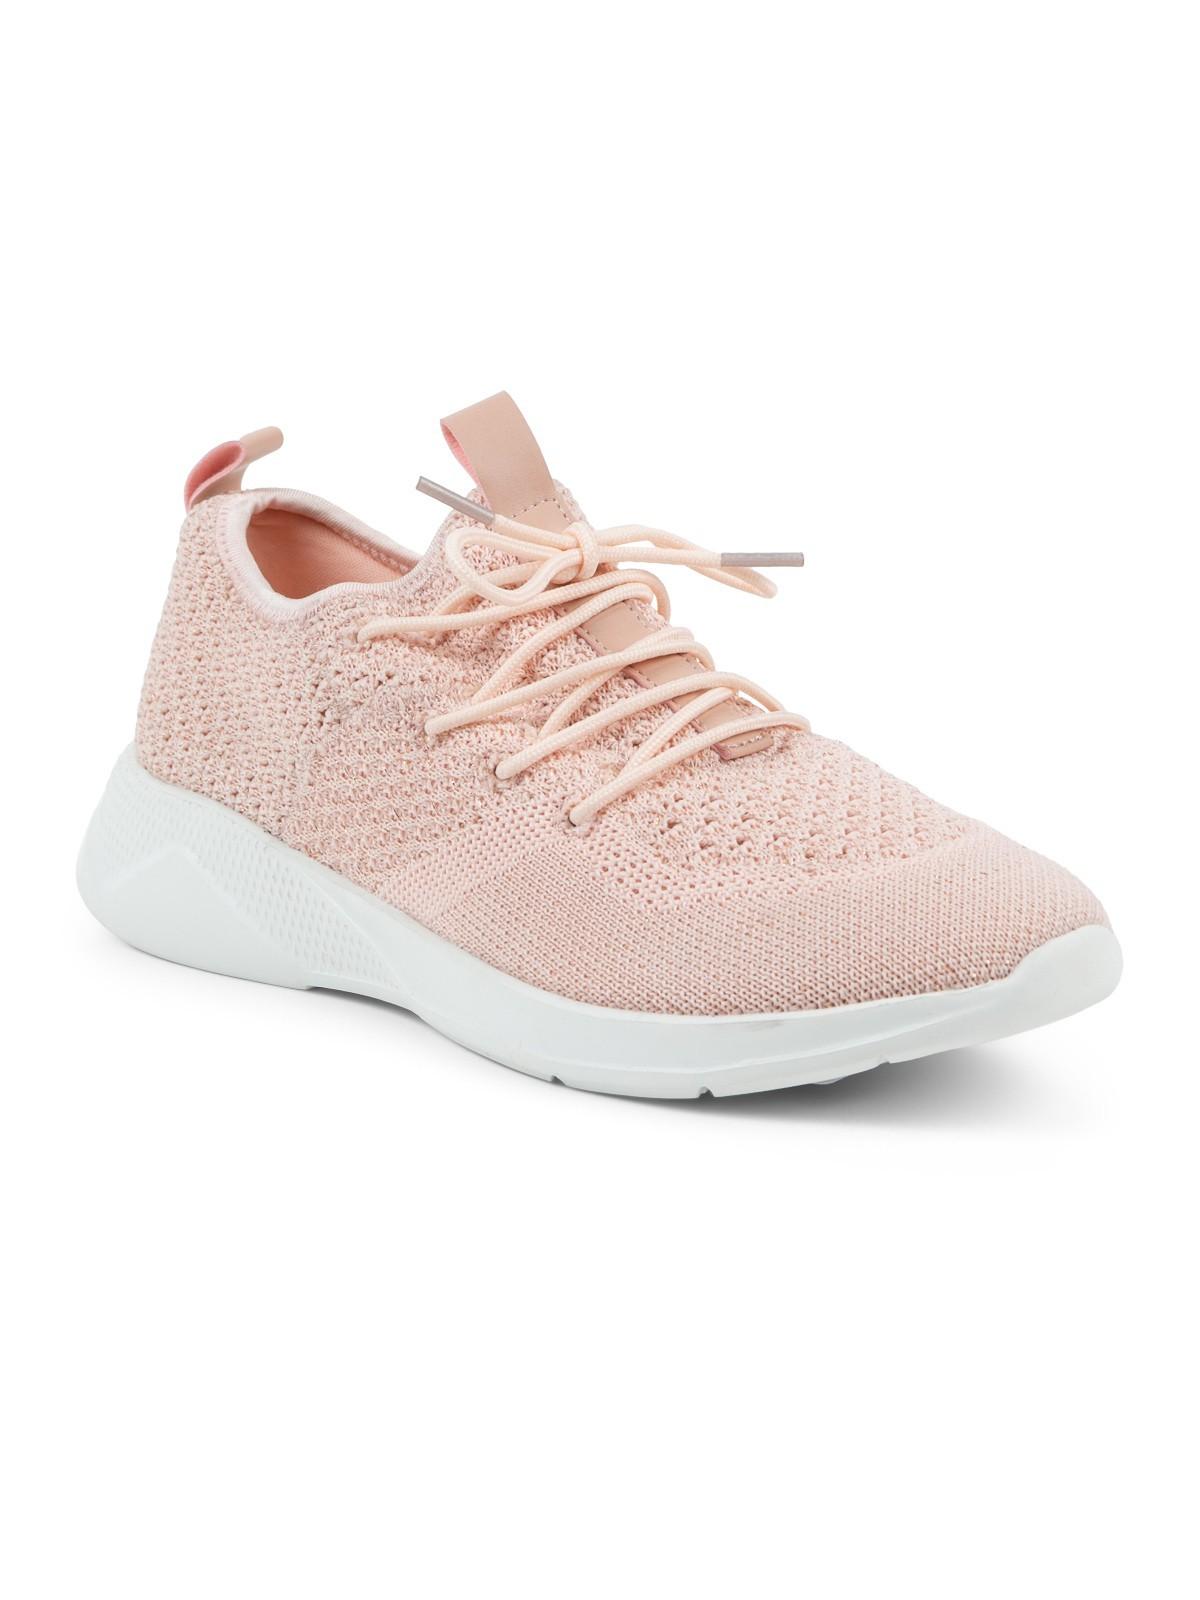 Chaussures sport femme rose (36-41) - DistriCenter